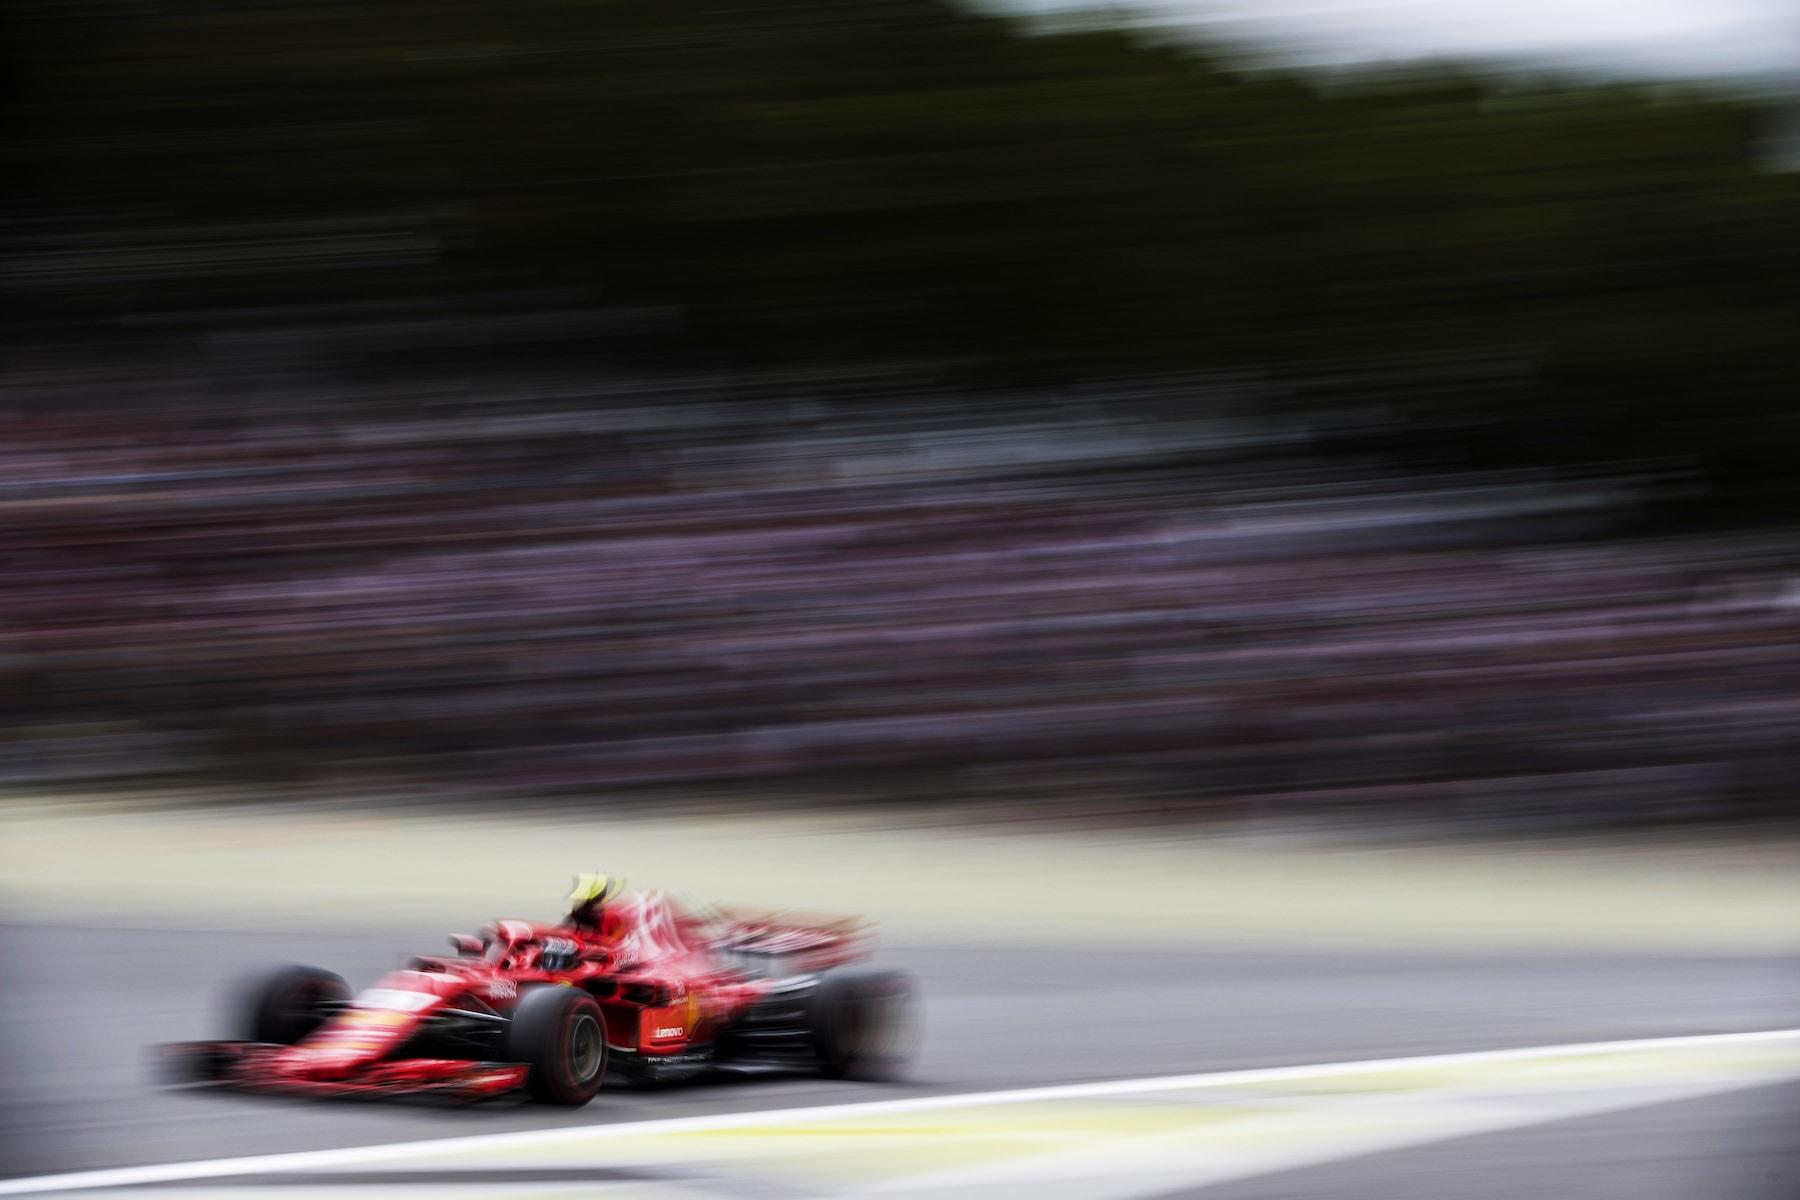 2 2018 Kimi Raikkonen | Ferrari SF71H | 2018 Brazilian GP Q3 1 copy.jpg